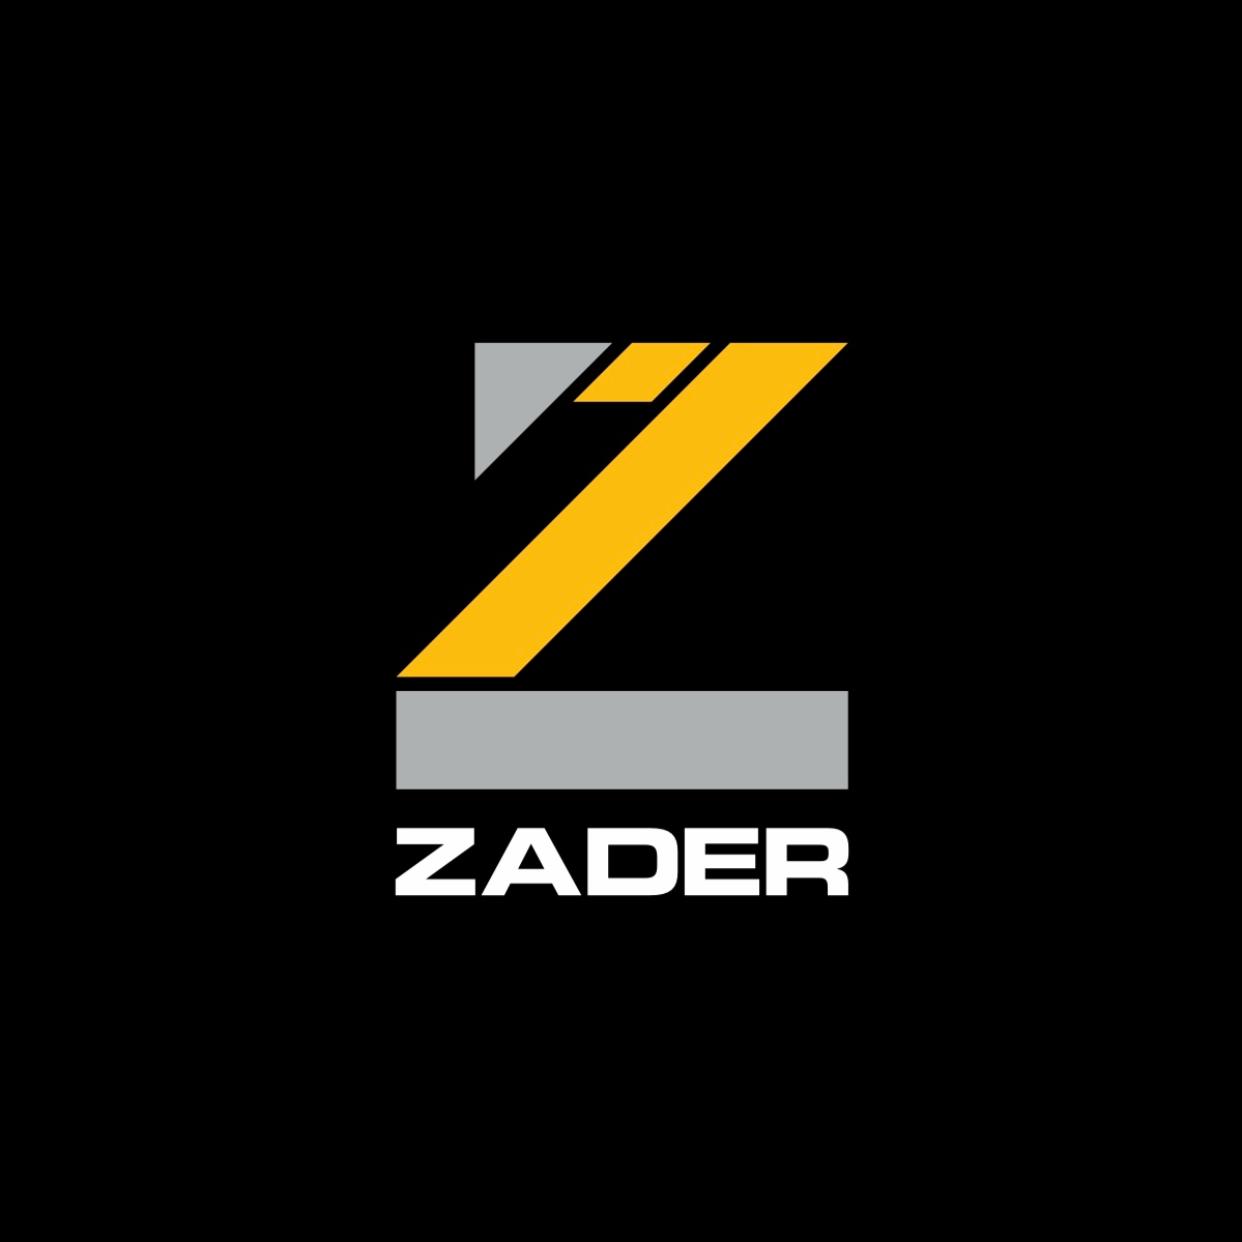 Zader Pty Ltd